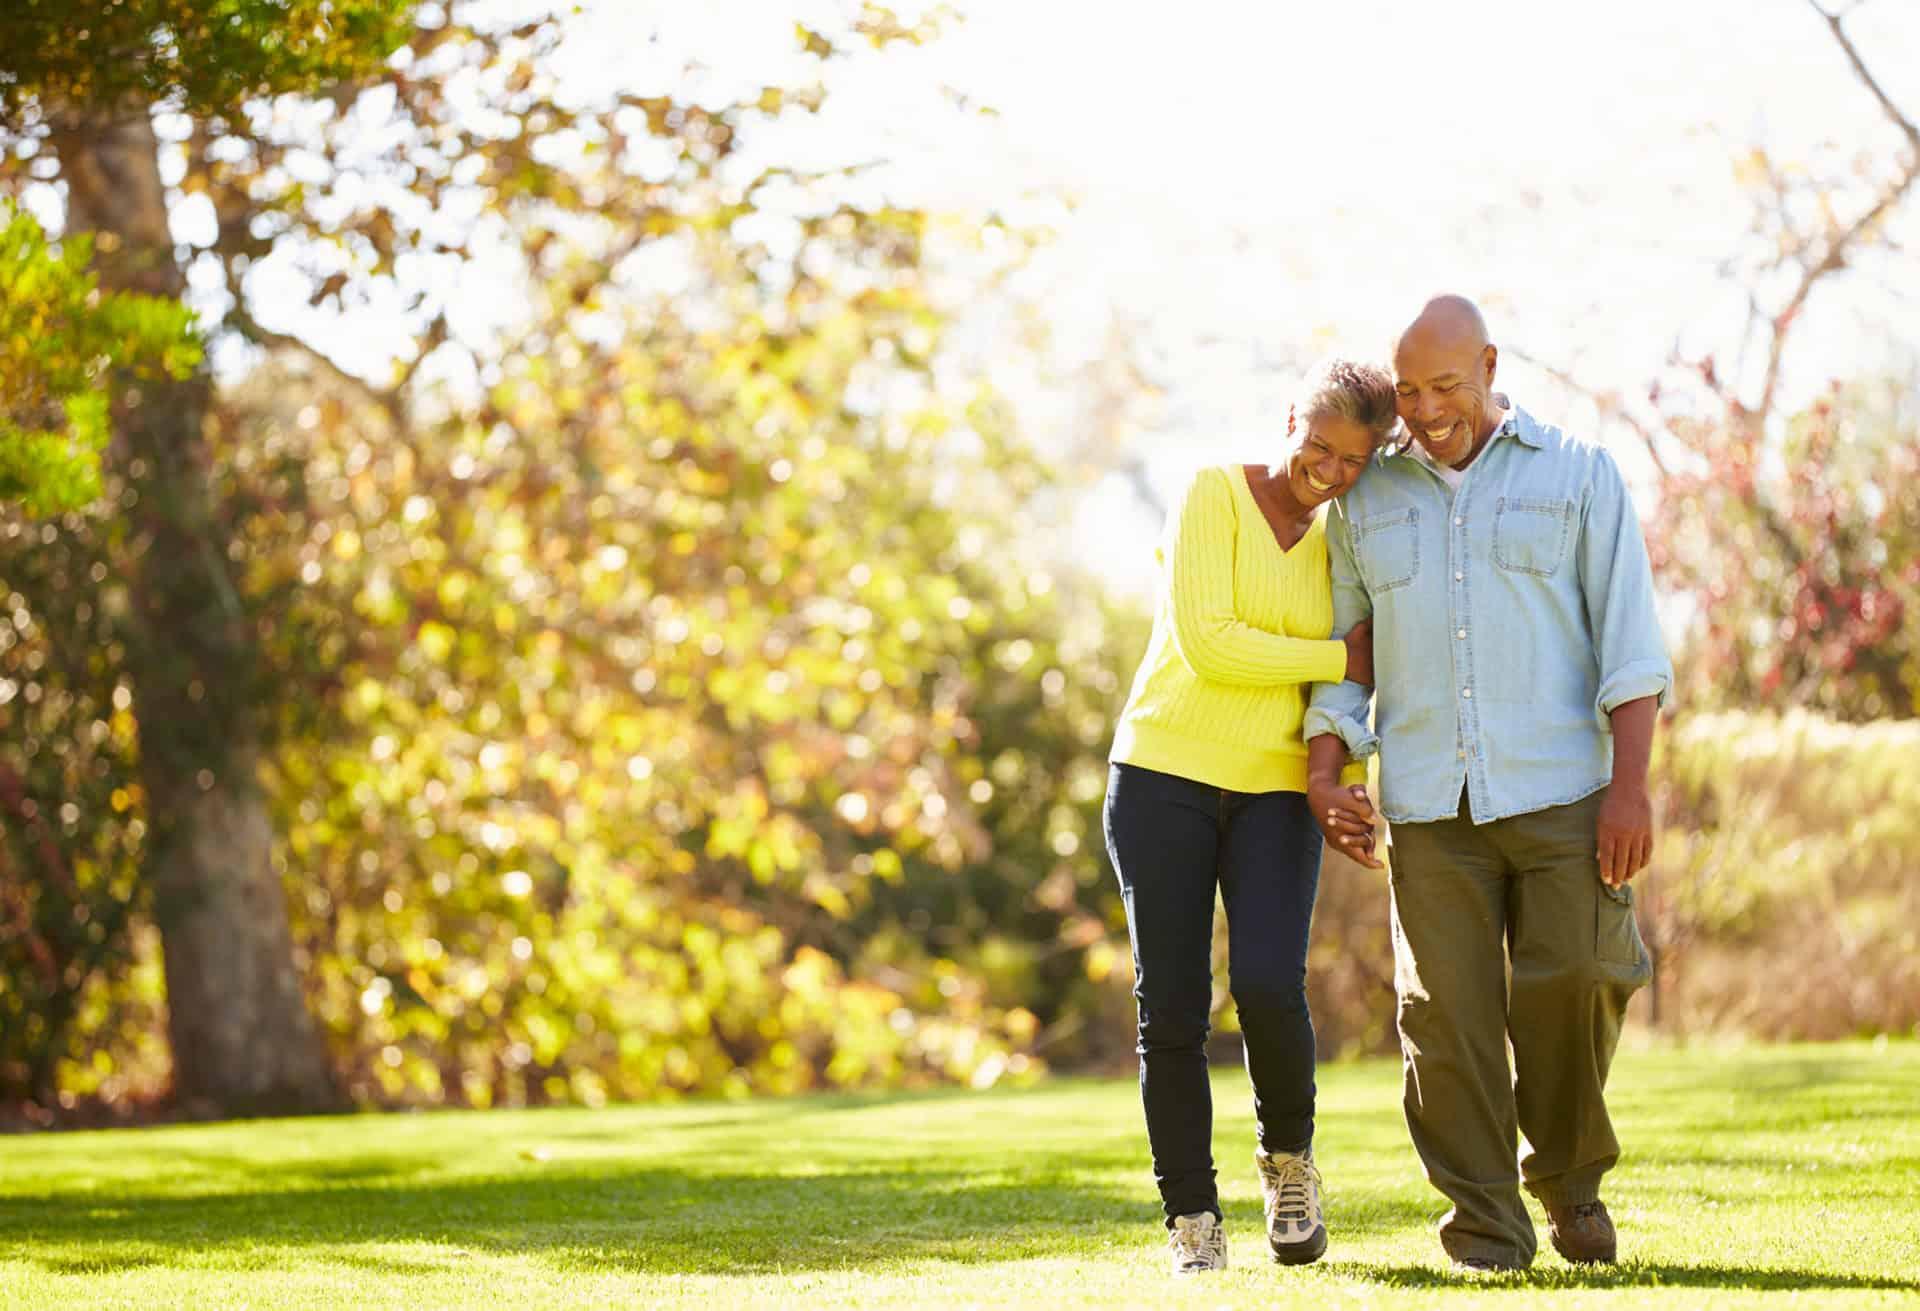 Senior couple walking through autumn woodland holding hands and smiling.